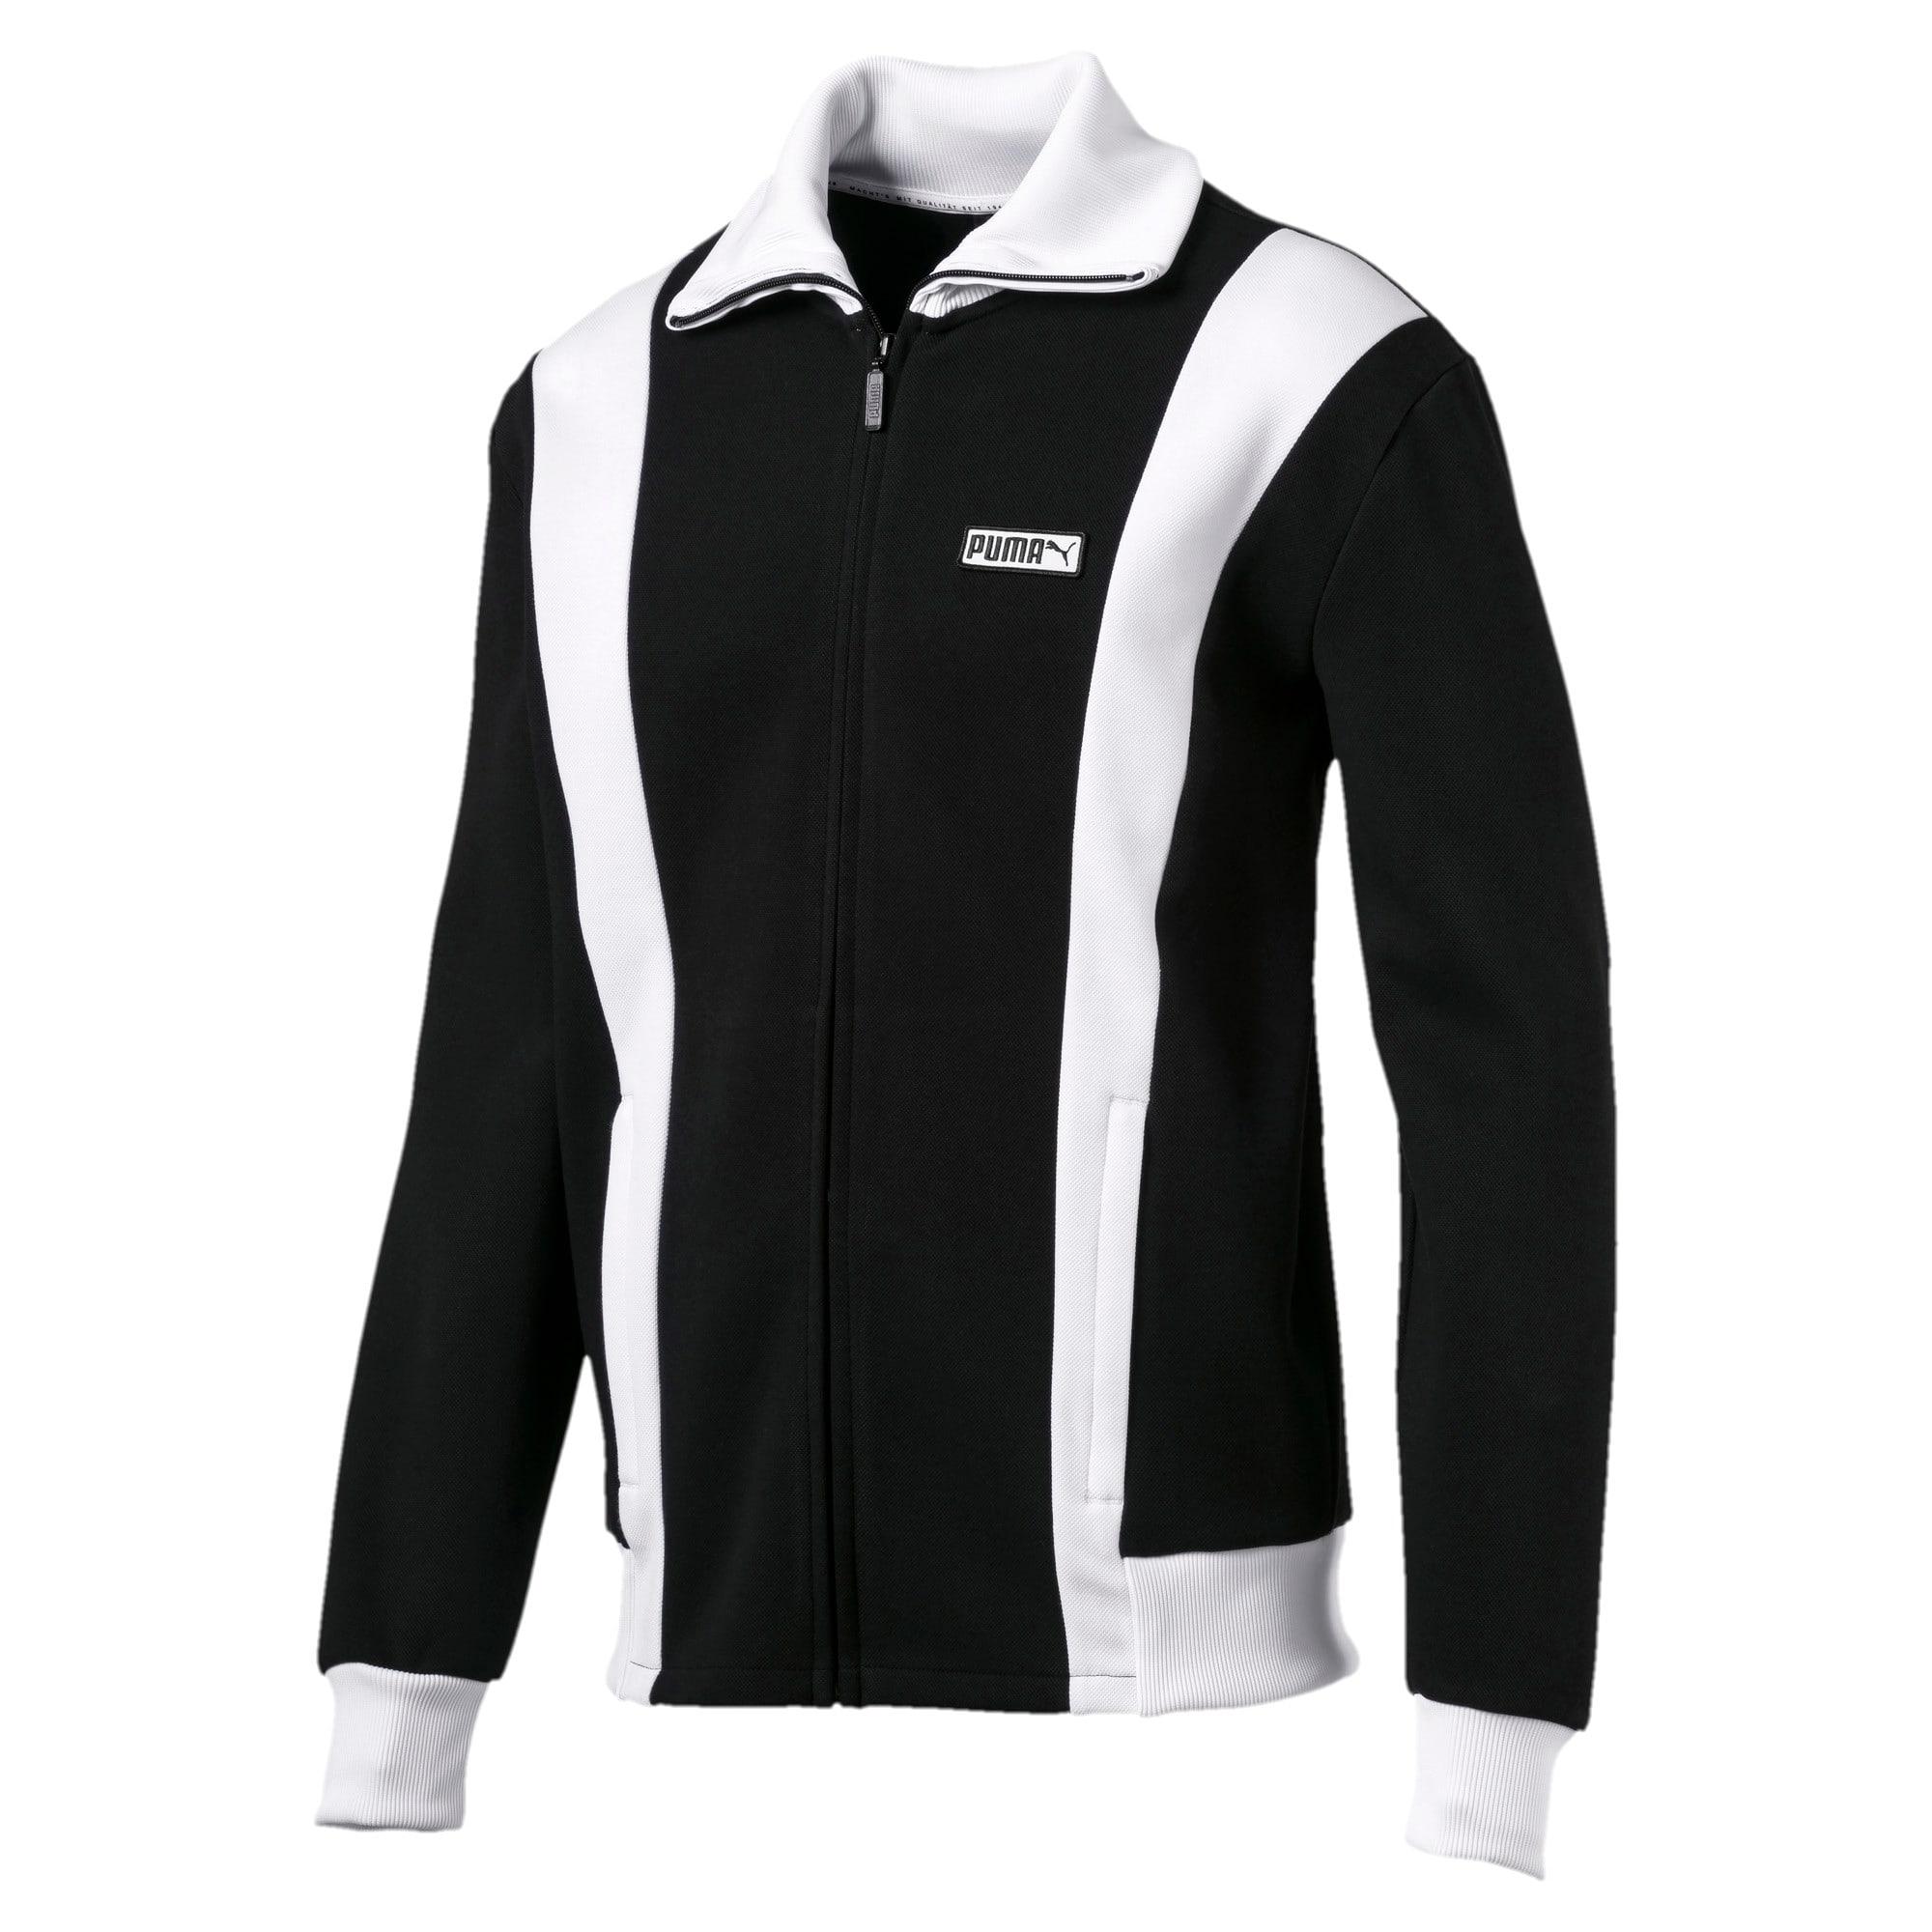 Thumbnail 1 of Iconic T7 Spezial Men's Track Jacket, Cotton Black, medium